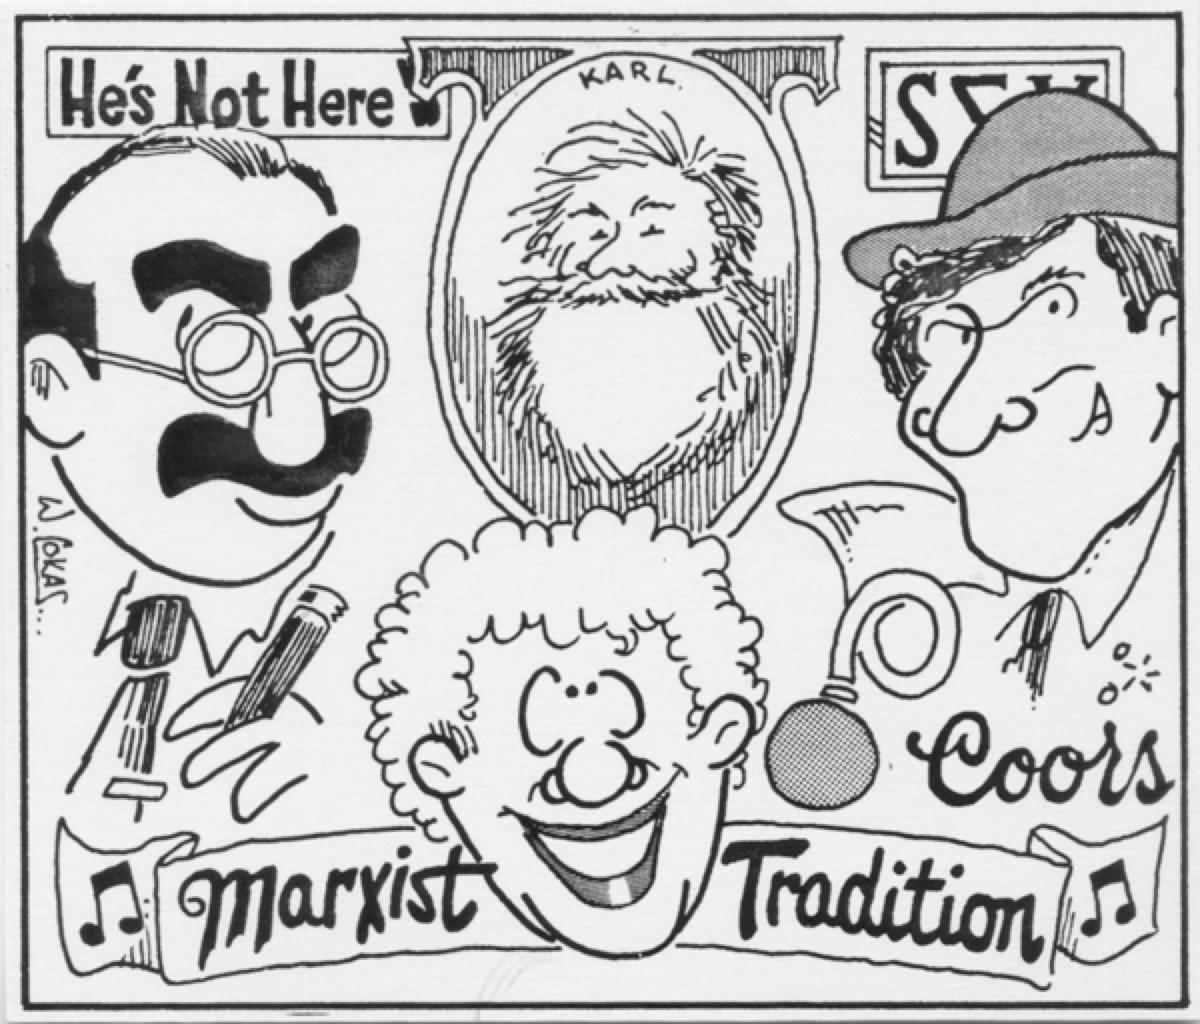 Marxist Tradition